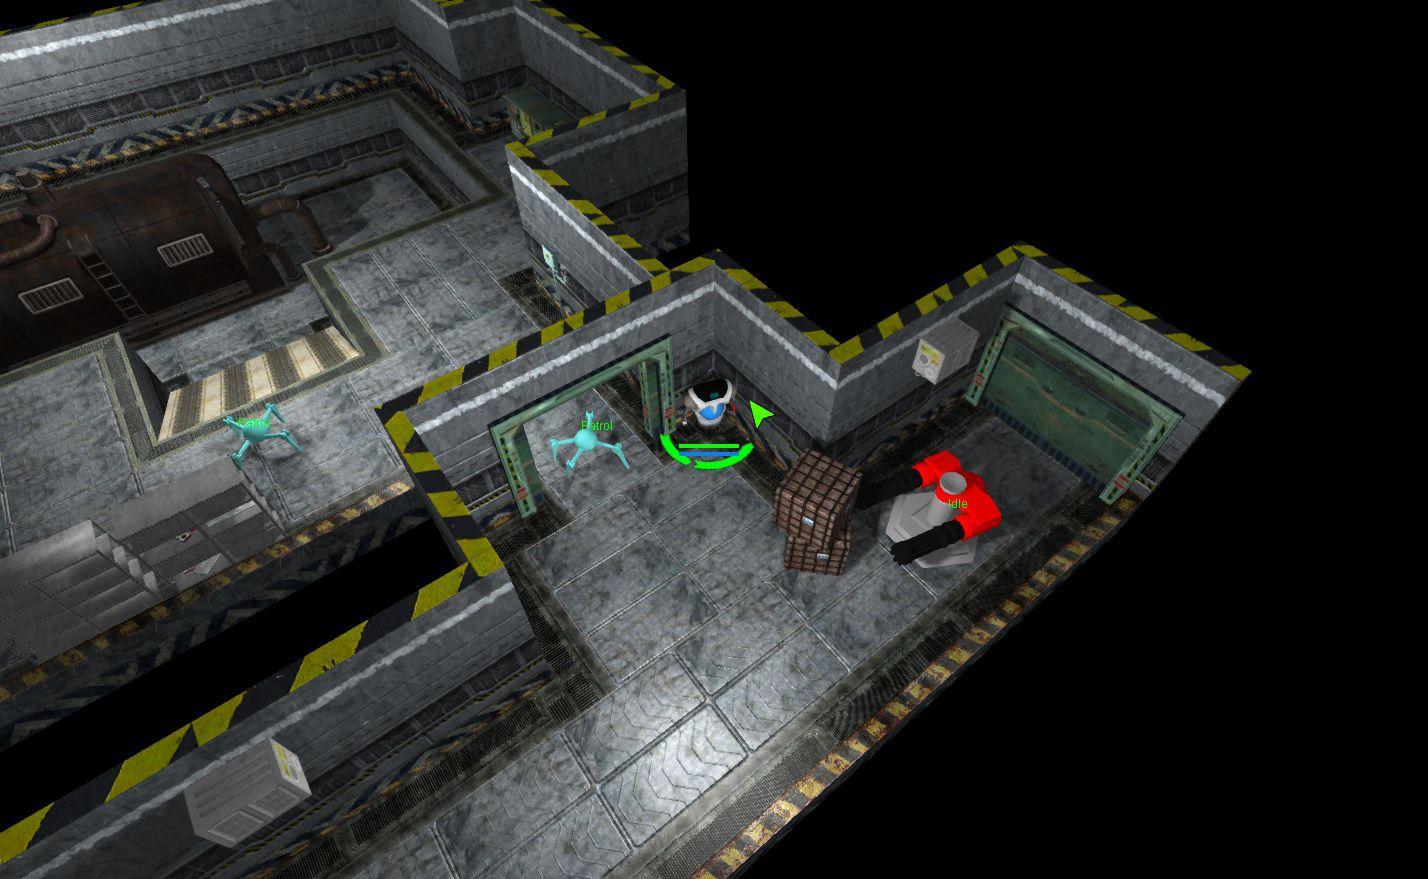 [recovery mode] Leadwerks — игровой движок под Linux вышел на Kickstarter